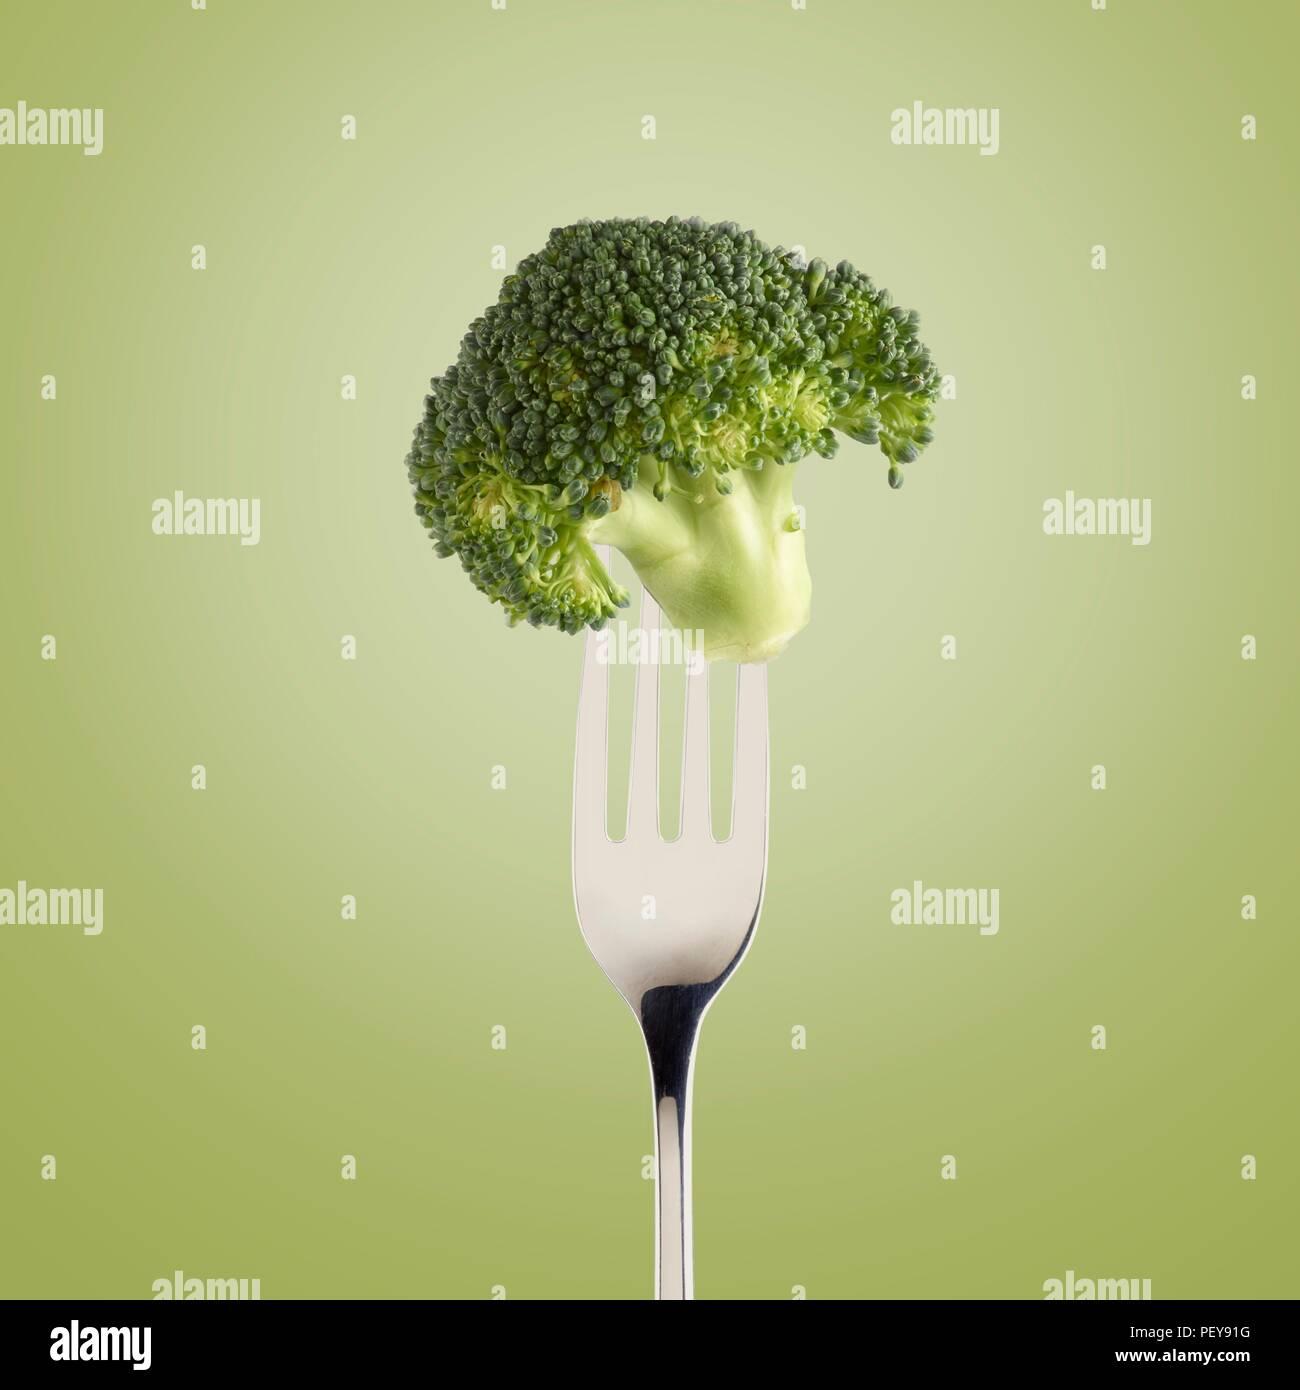 Le brocoli sur une fourchette. Photo Stock